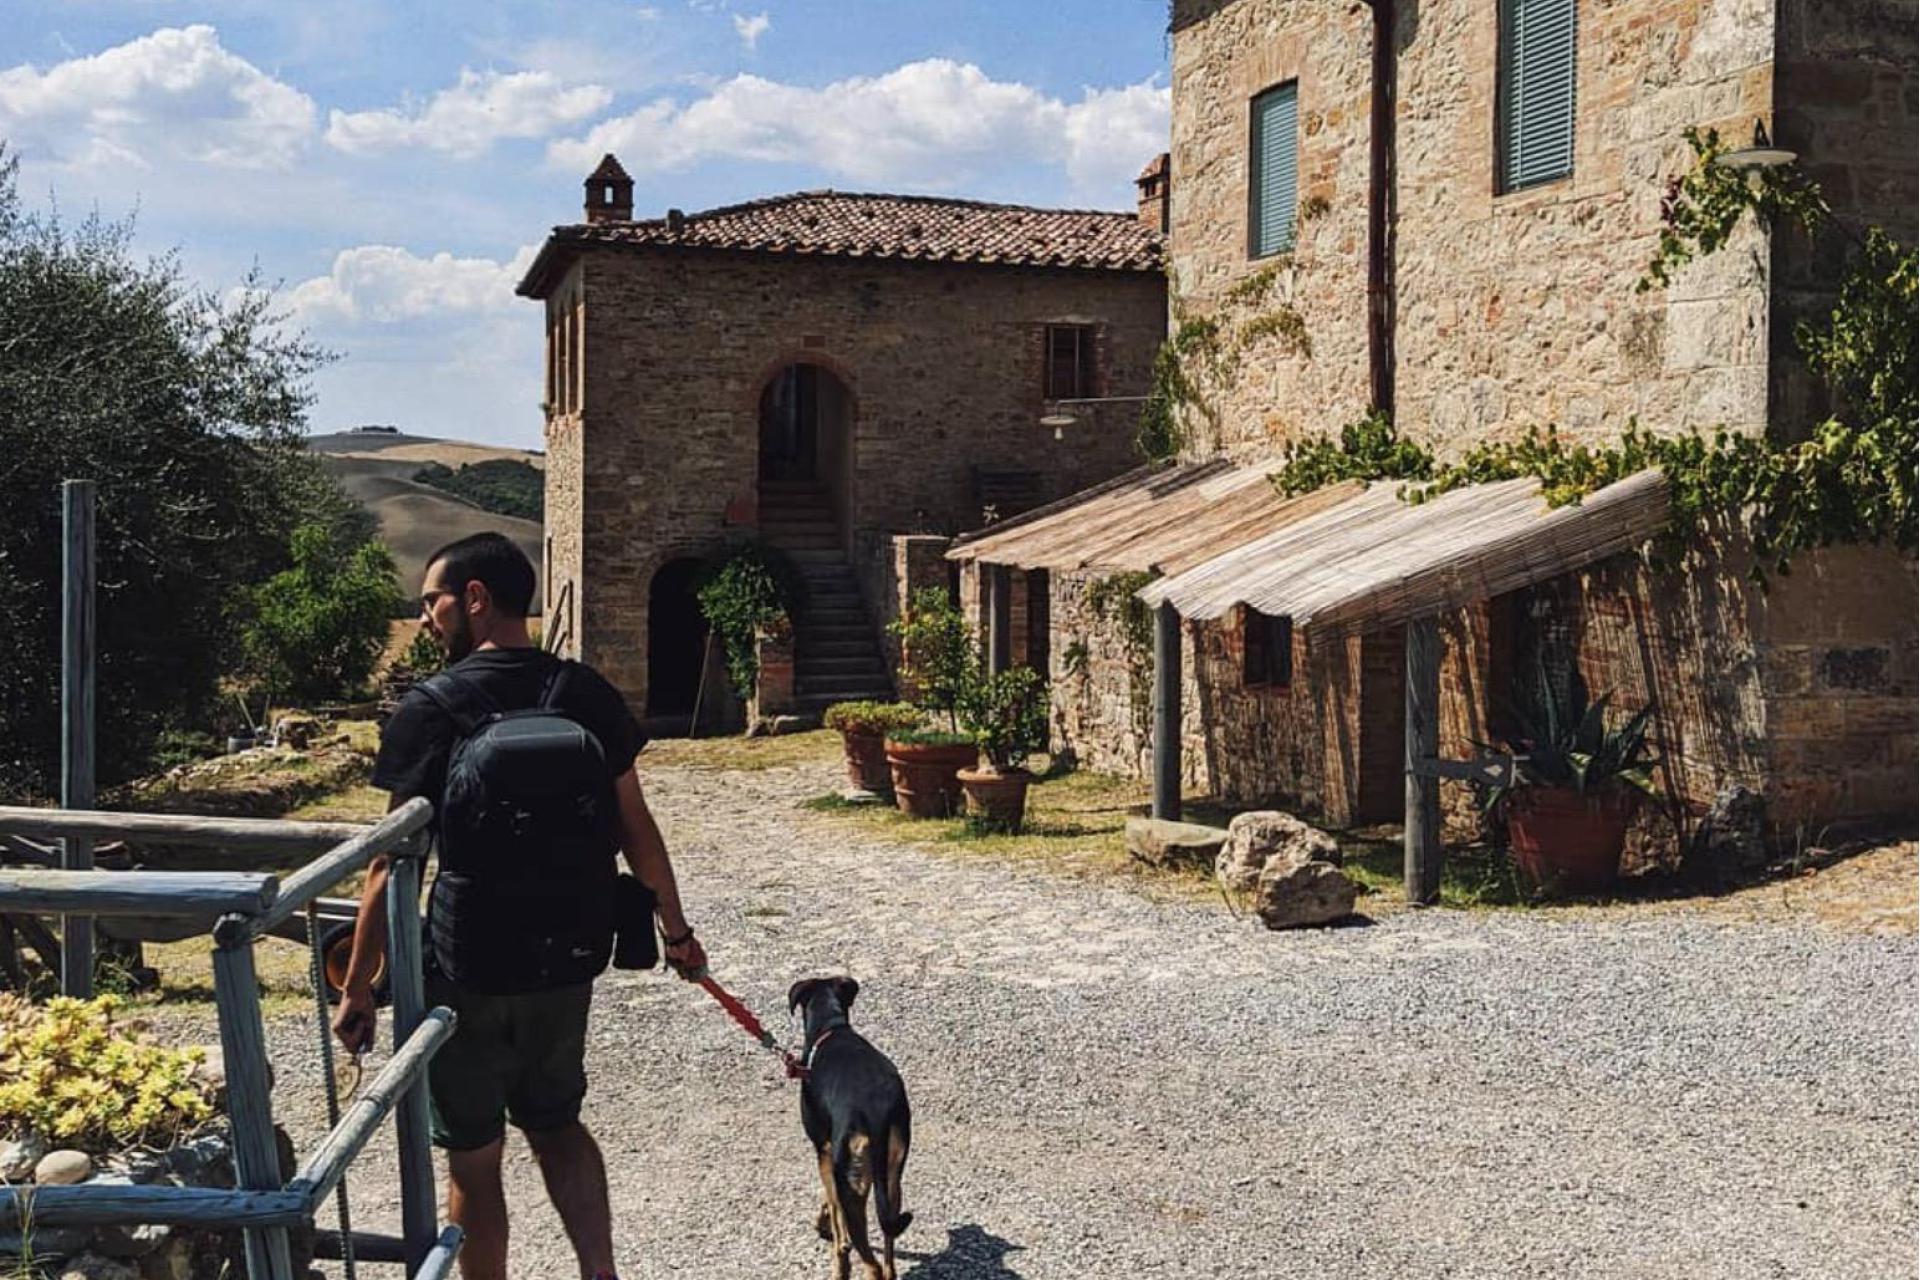 Agriturismo Toskana Agriturismo Pienza mit atemberaubender Aussicht | myitalyselection.de